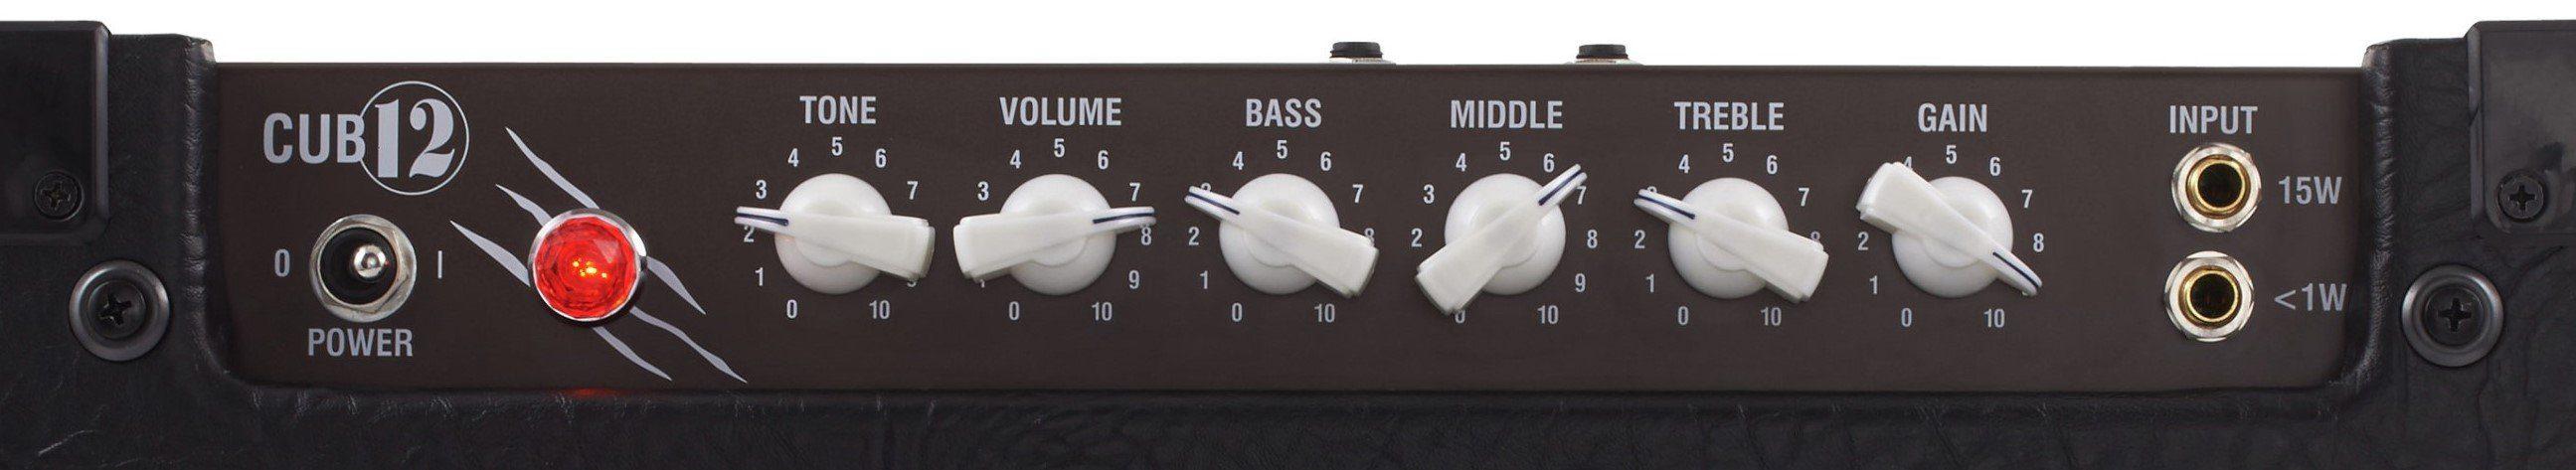 Laney-Cub12-Guitar-Amp-Top-Panel